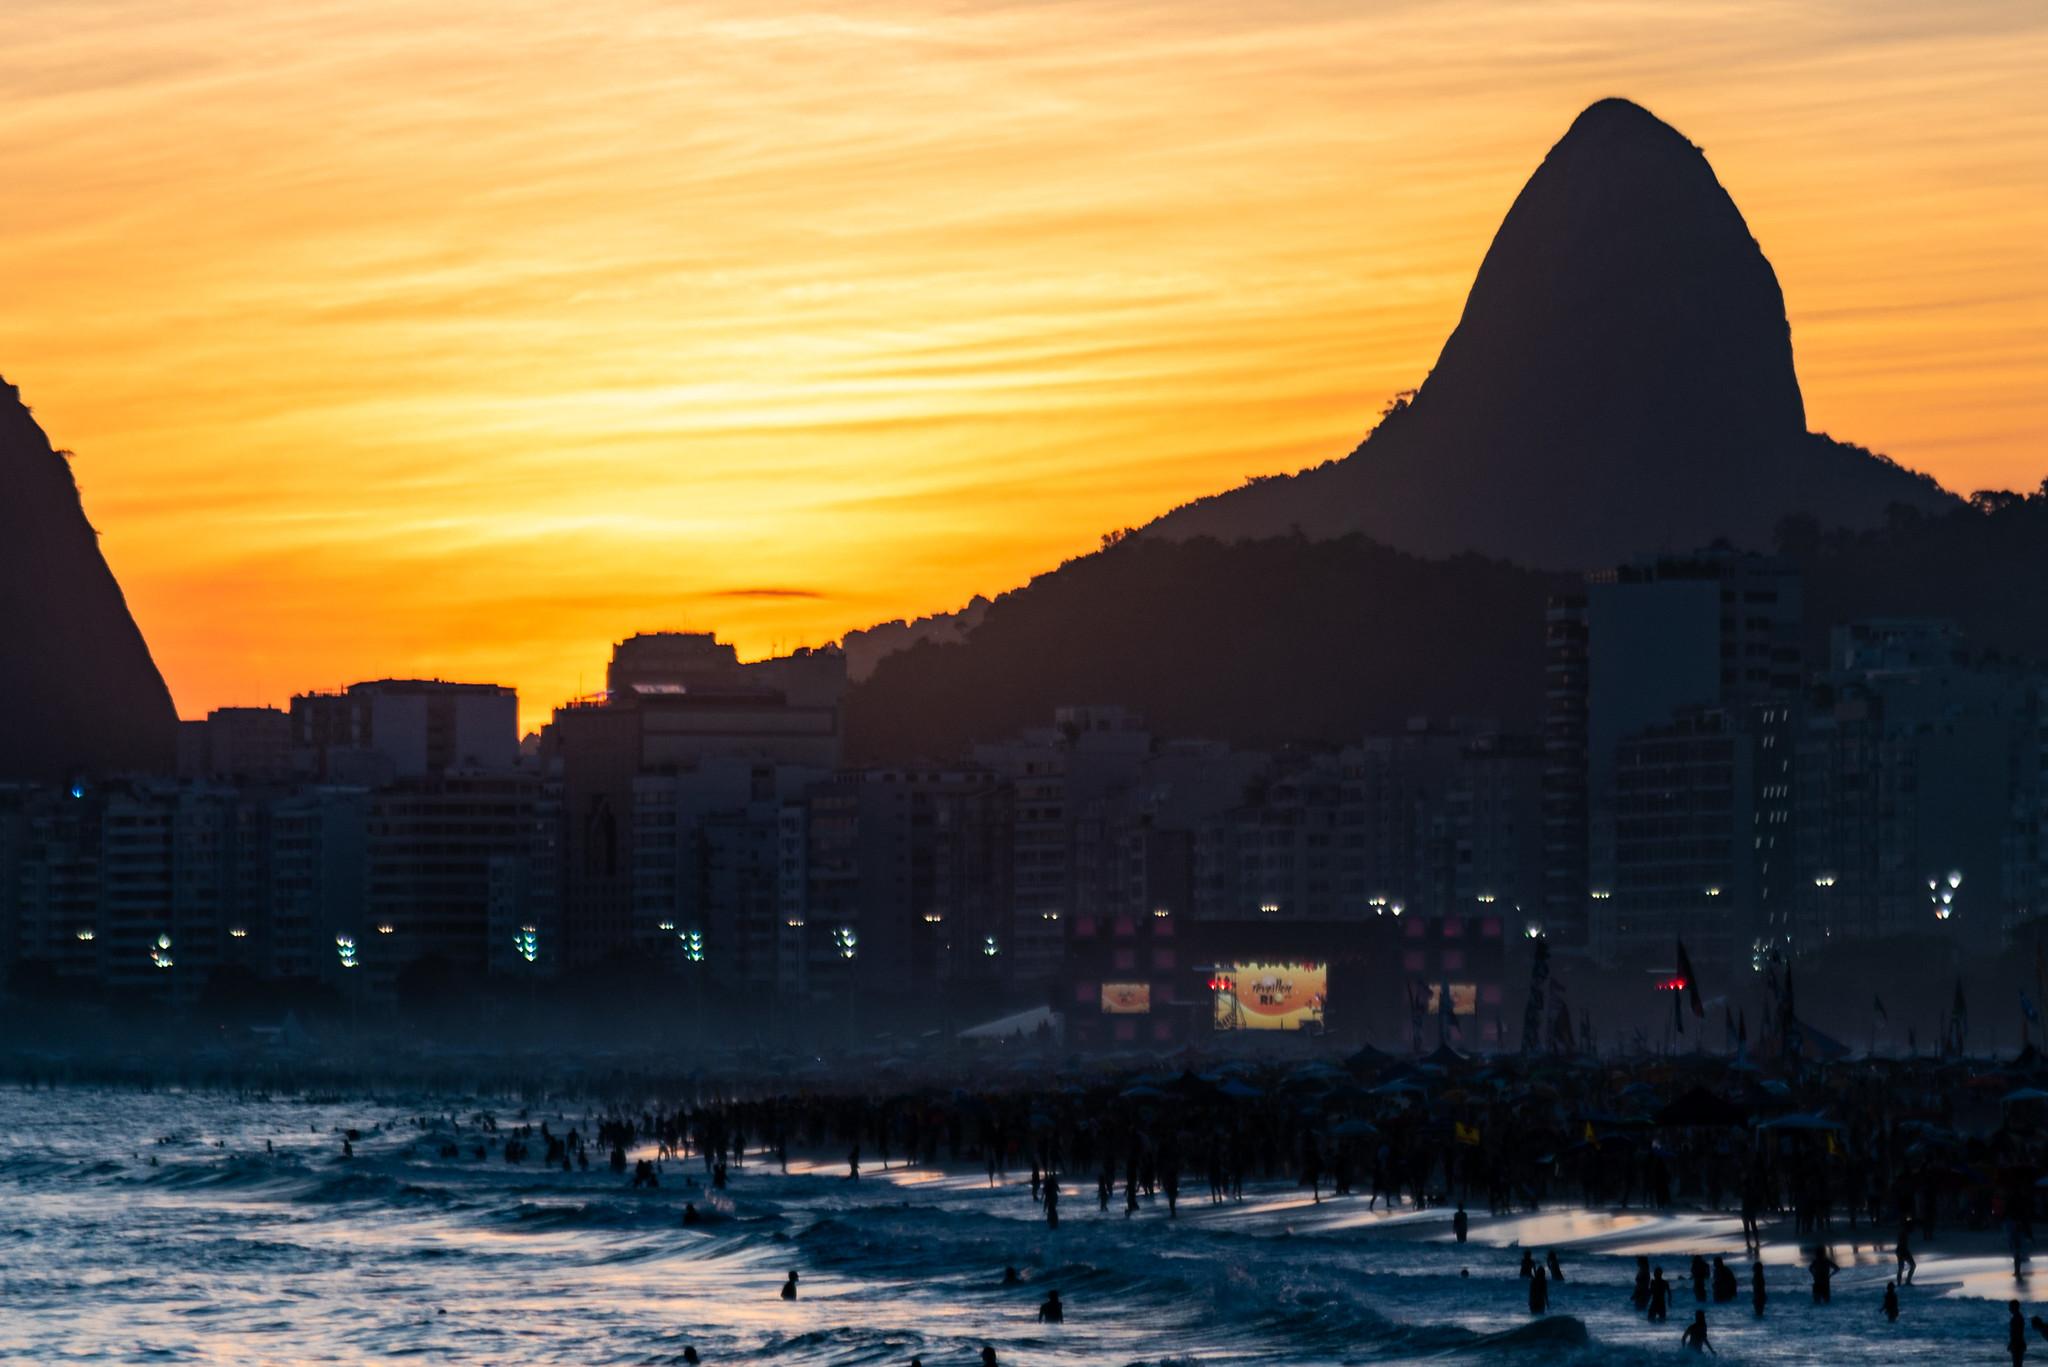 Réveillon Rio 2020 -  Praia de Copacabana - Rio de Janeiro. 31.12.2019. Photo: Alex Ferro / Riotur.